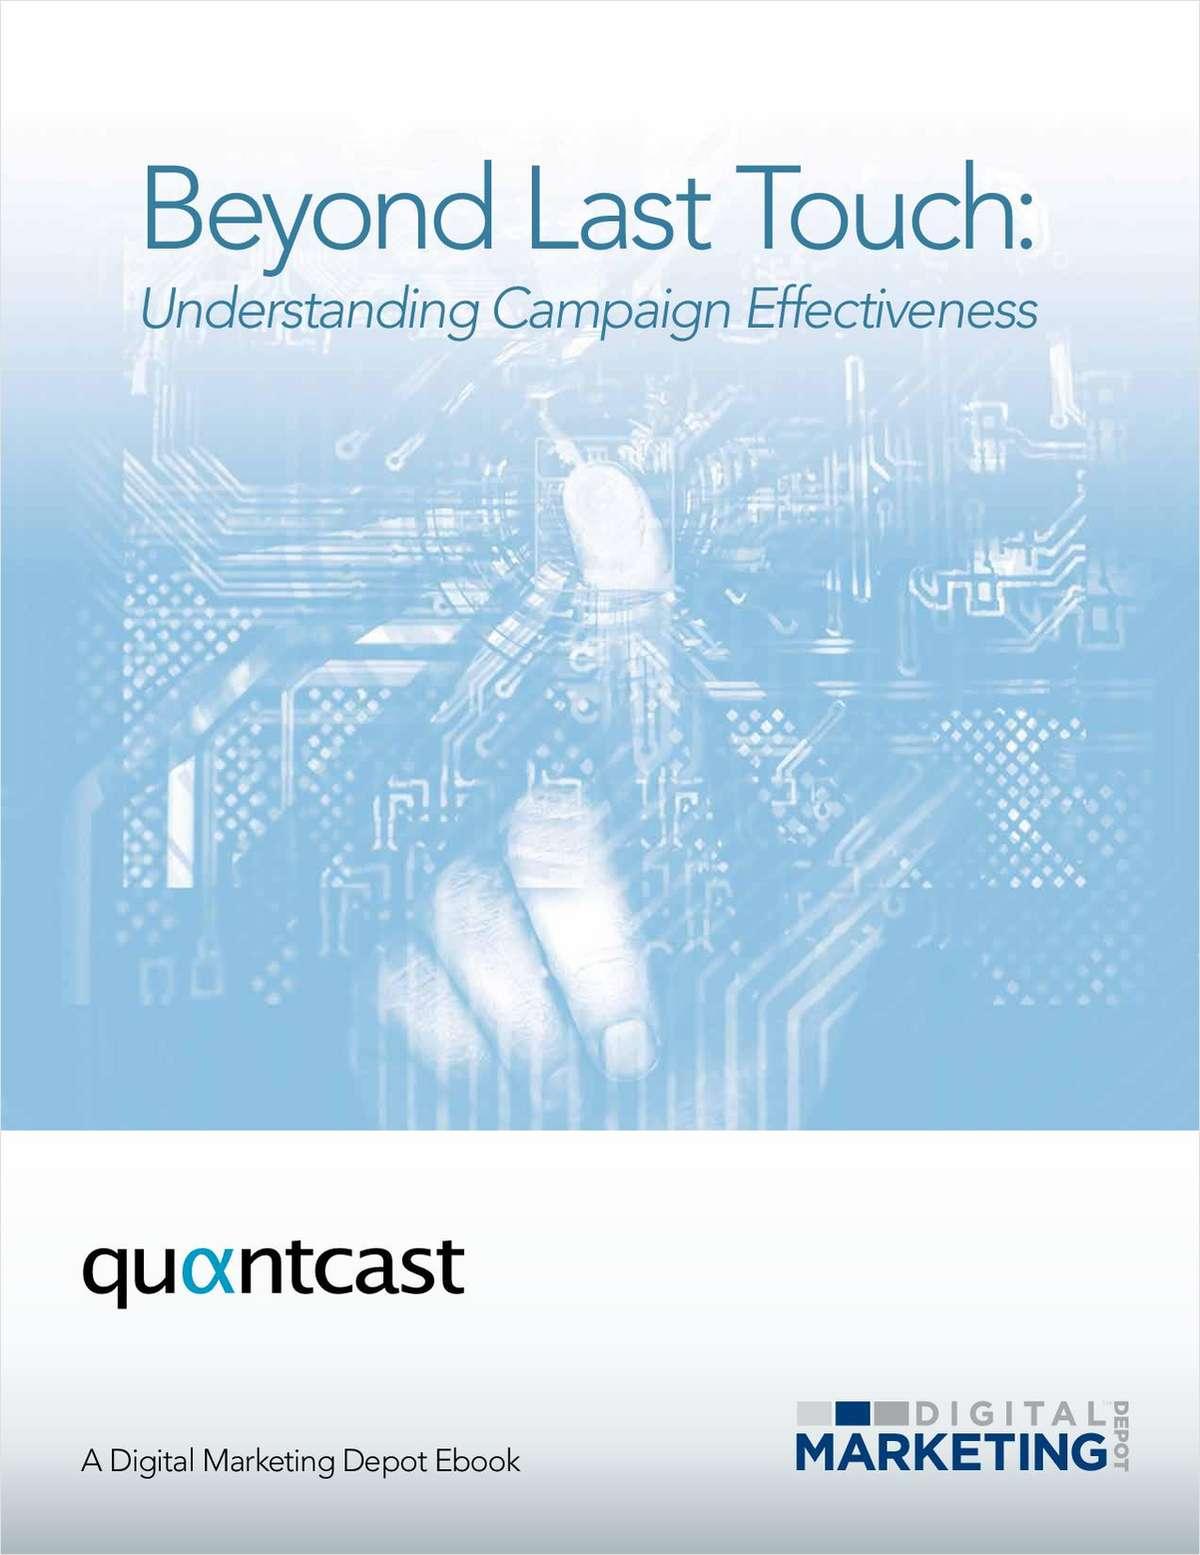 Beyond Last Touch: Understanding Campaign Effectiveness